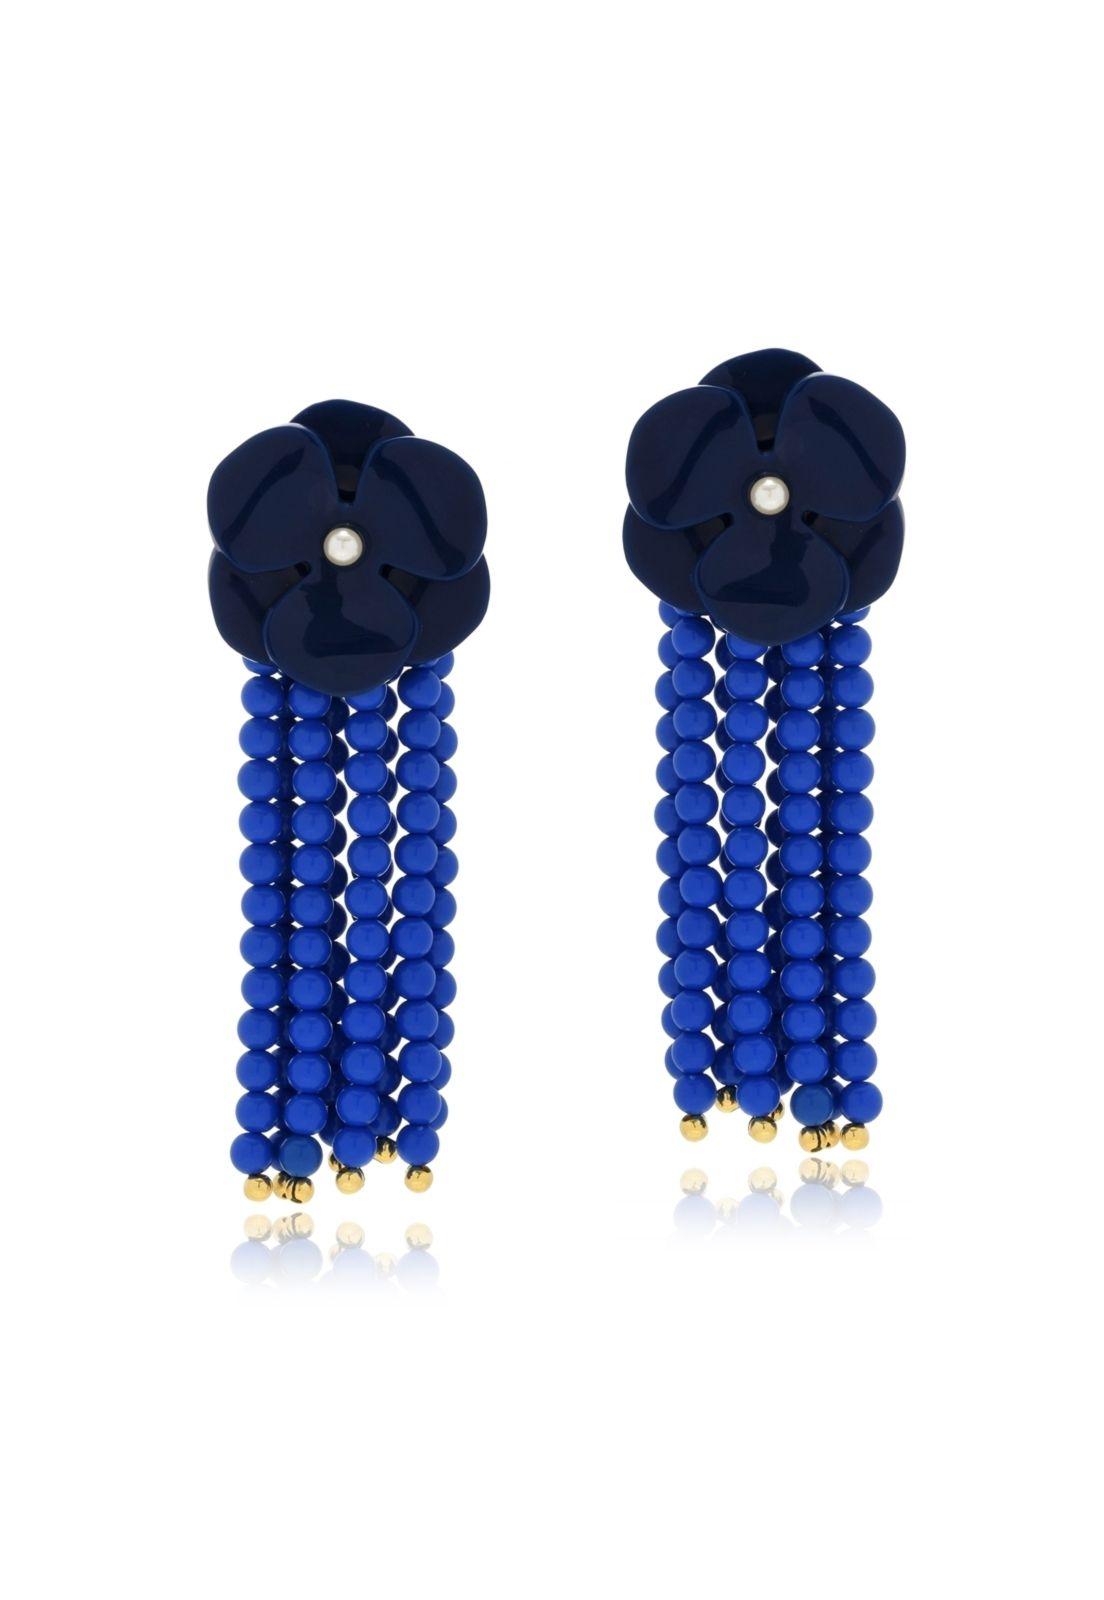 Brinco Le Diamond Véria Flor com Miolo de Pérola e Franja Azul